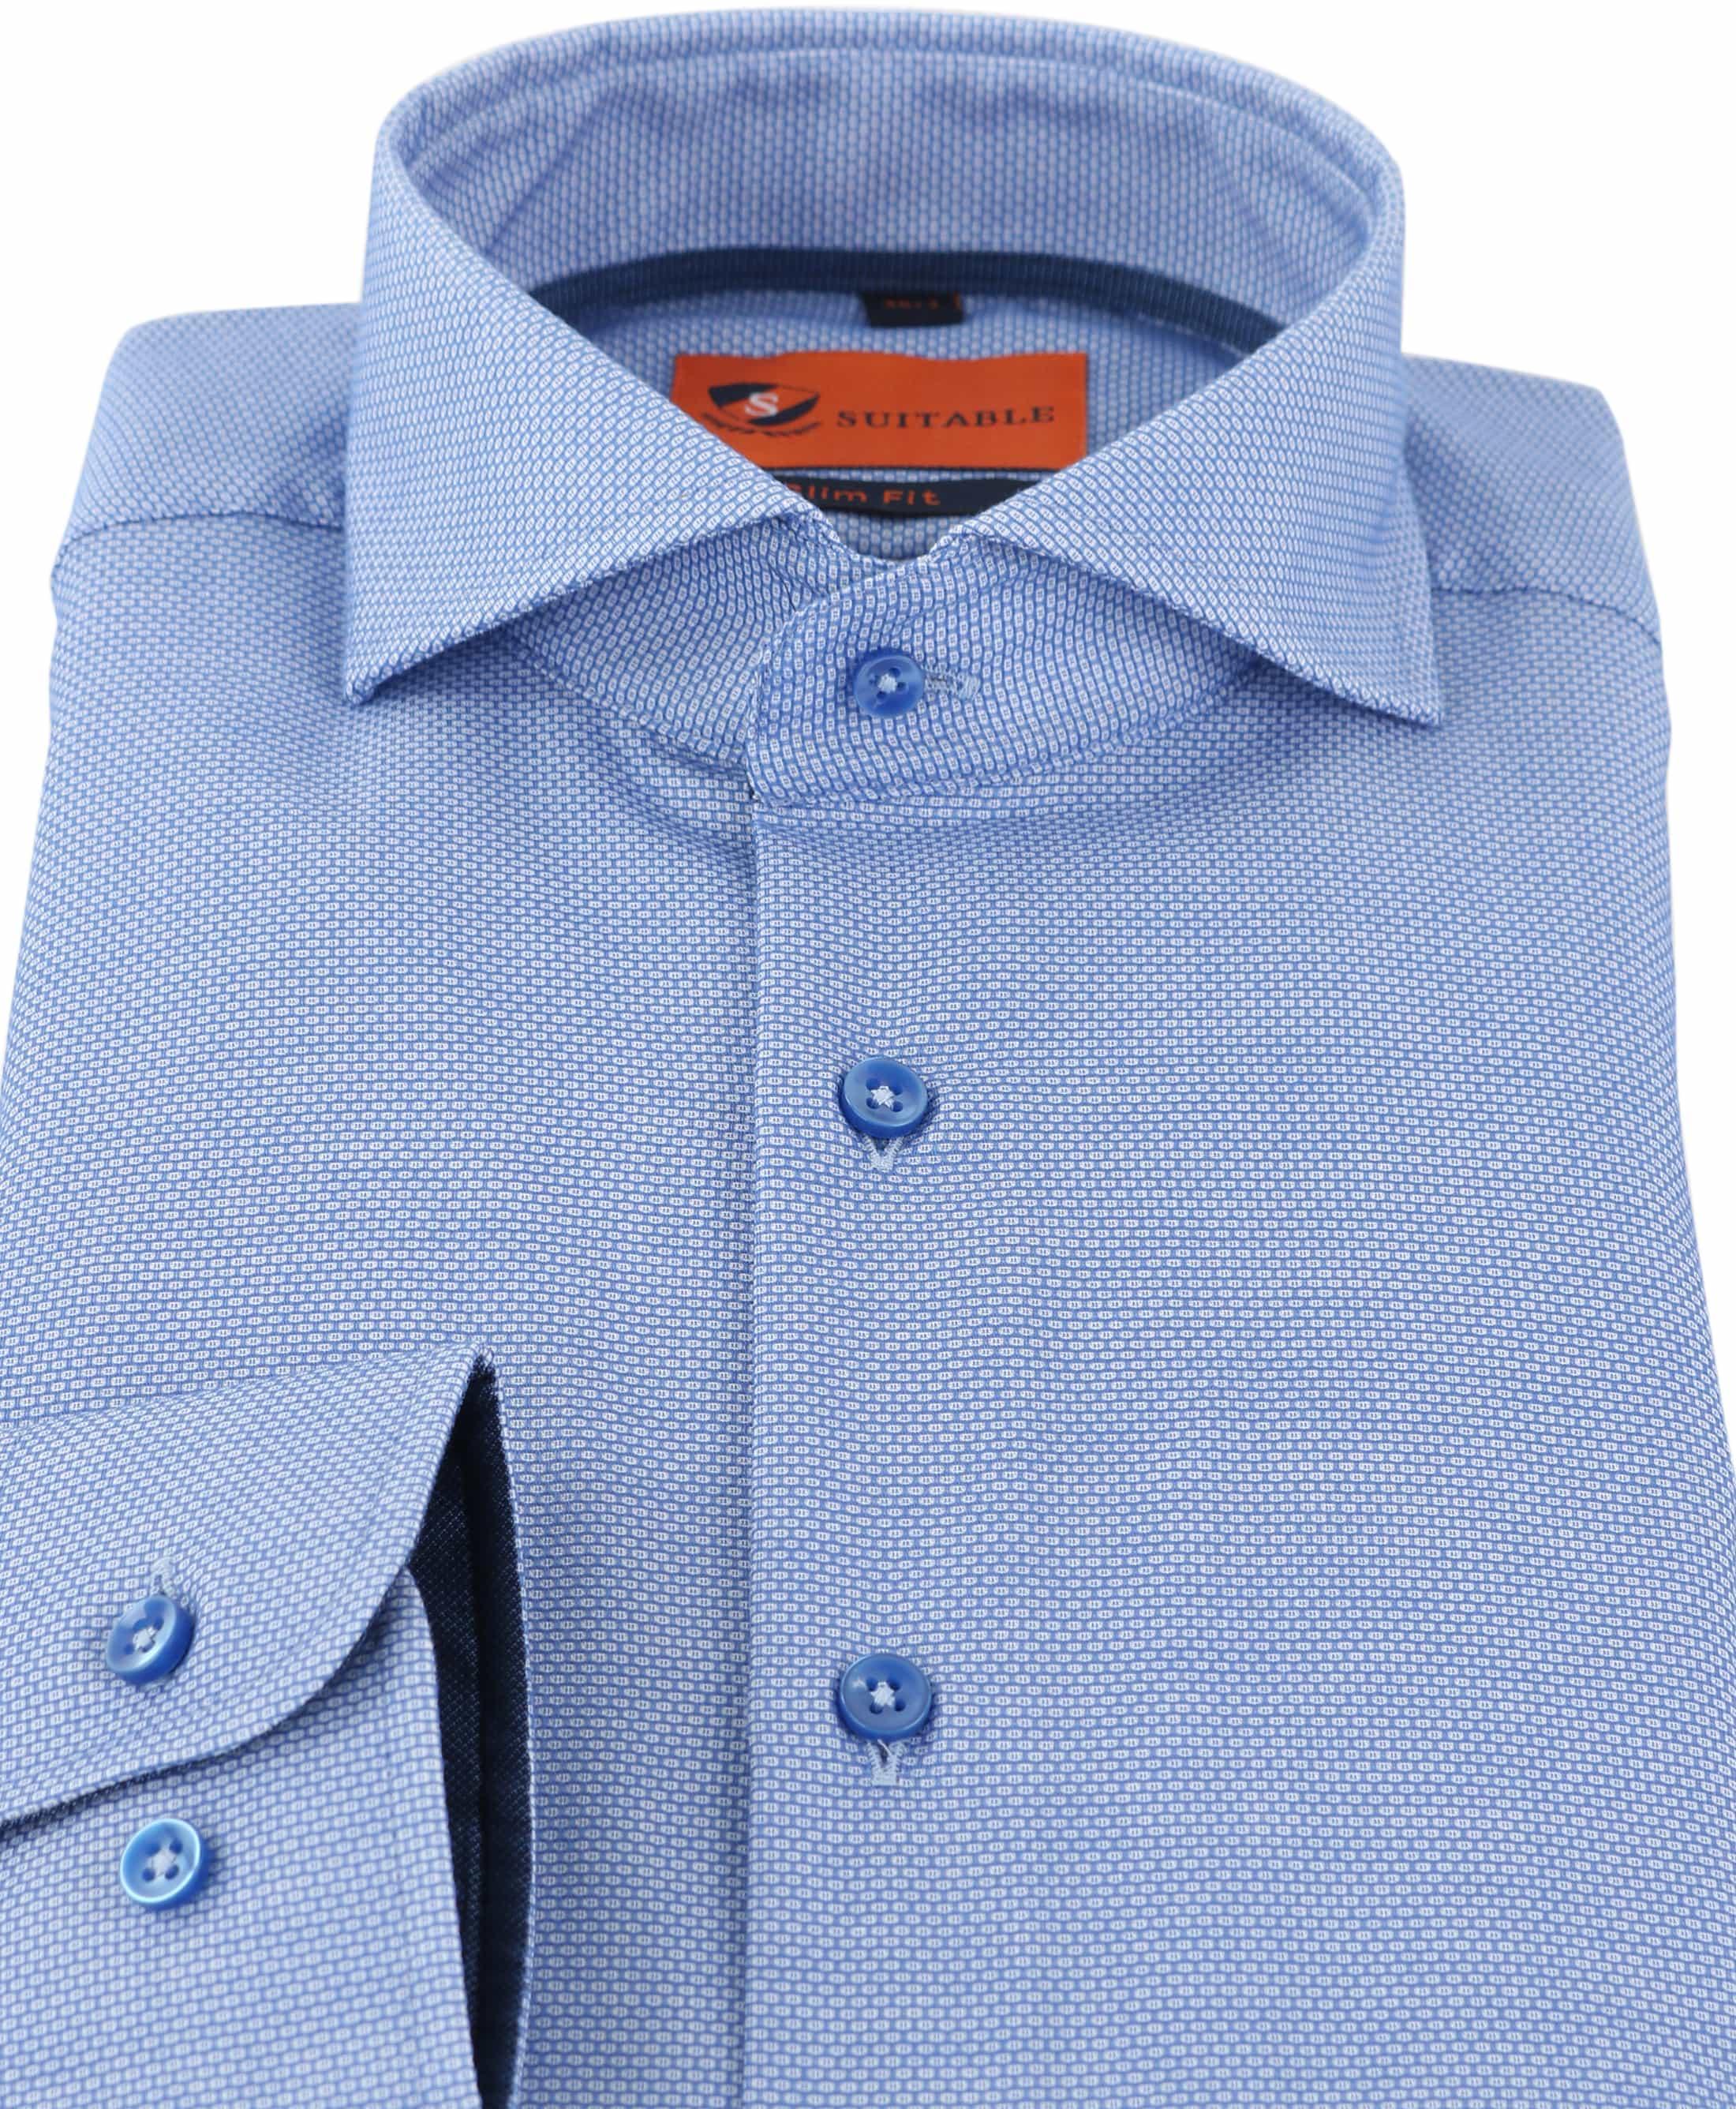 Mouwlengte 7 Overhemd Blauw 150-3 foto 1